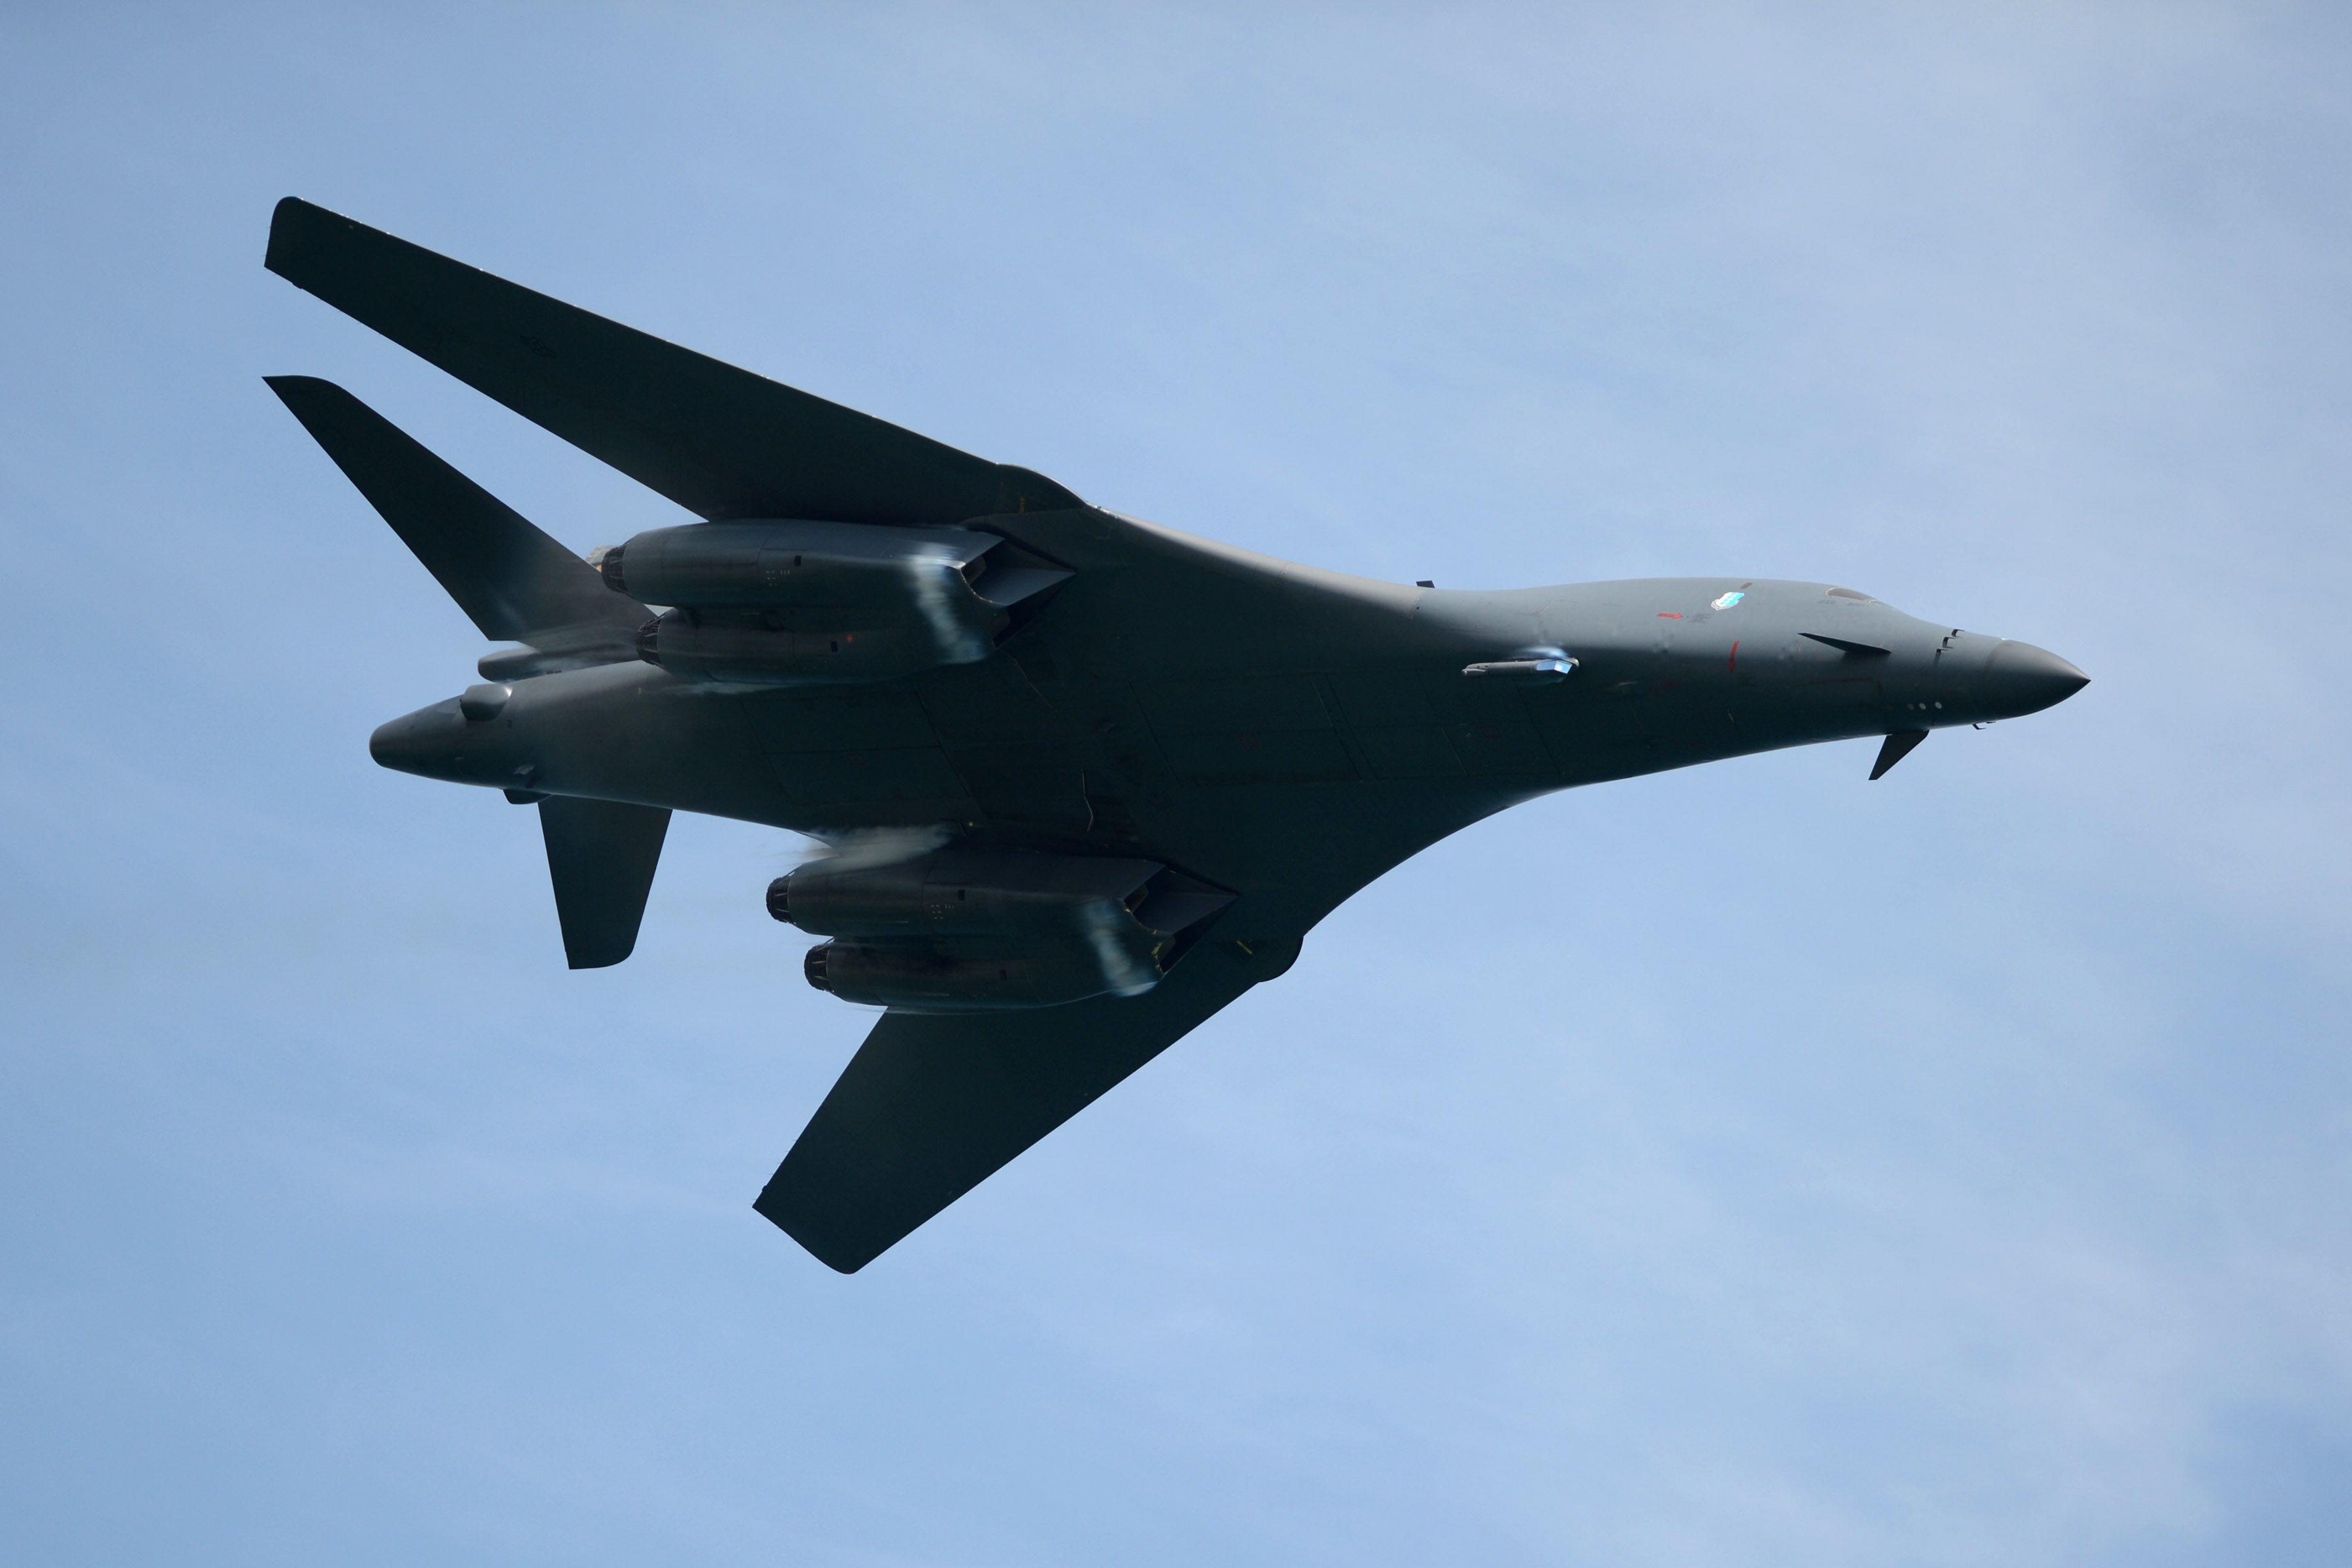 The B-1B Bomber Could Bulk Up on Long-Range Weapons